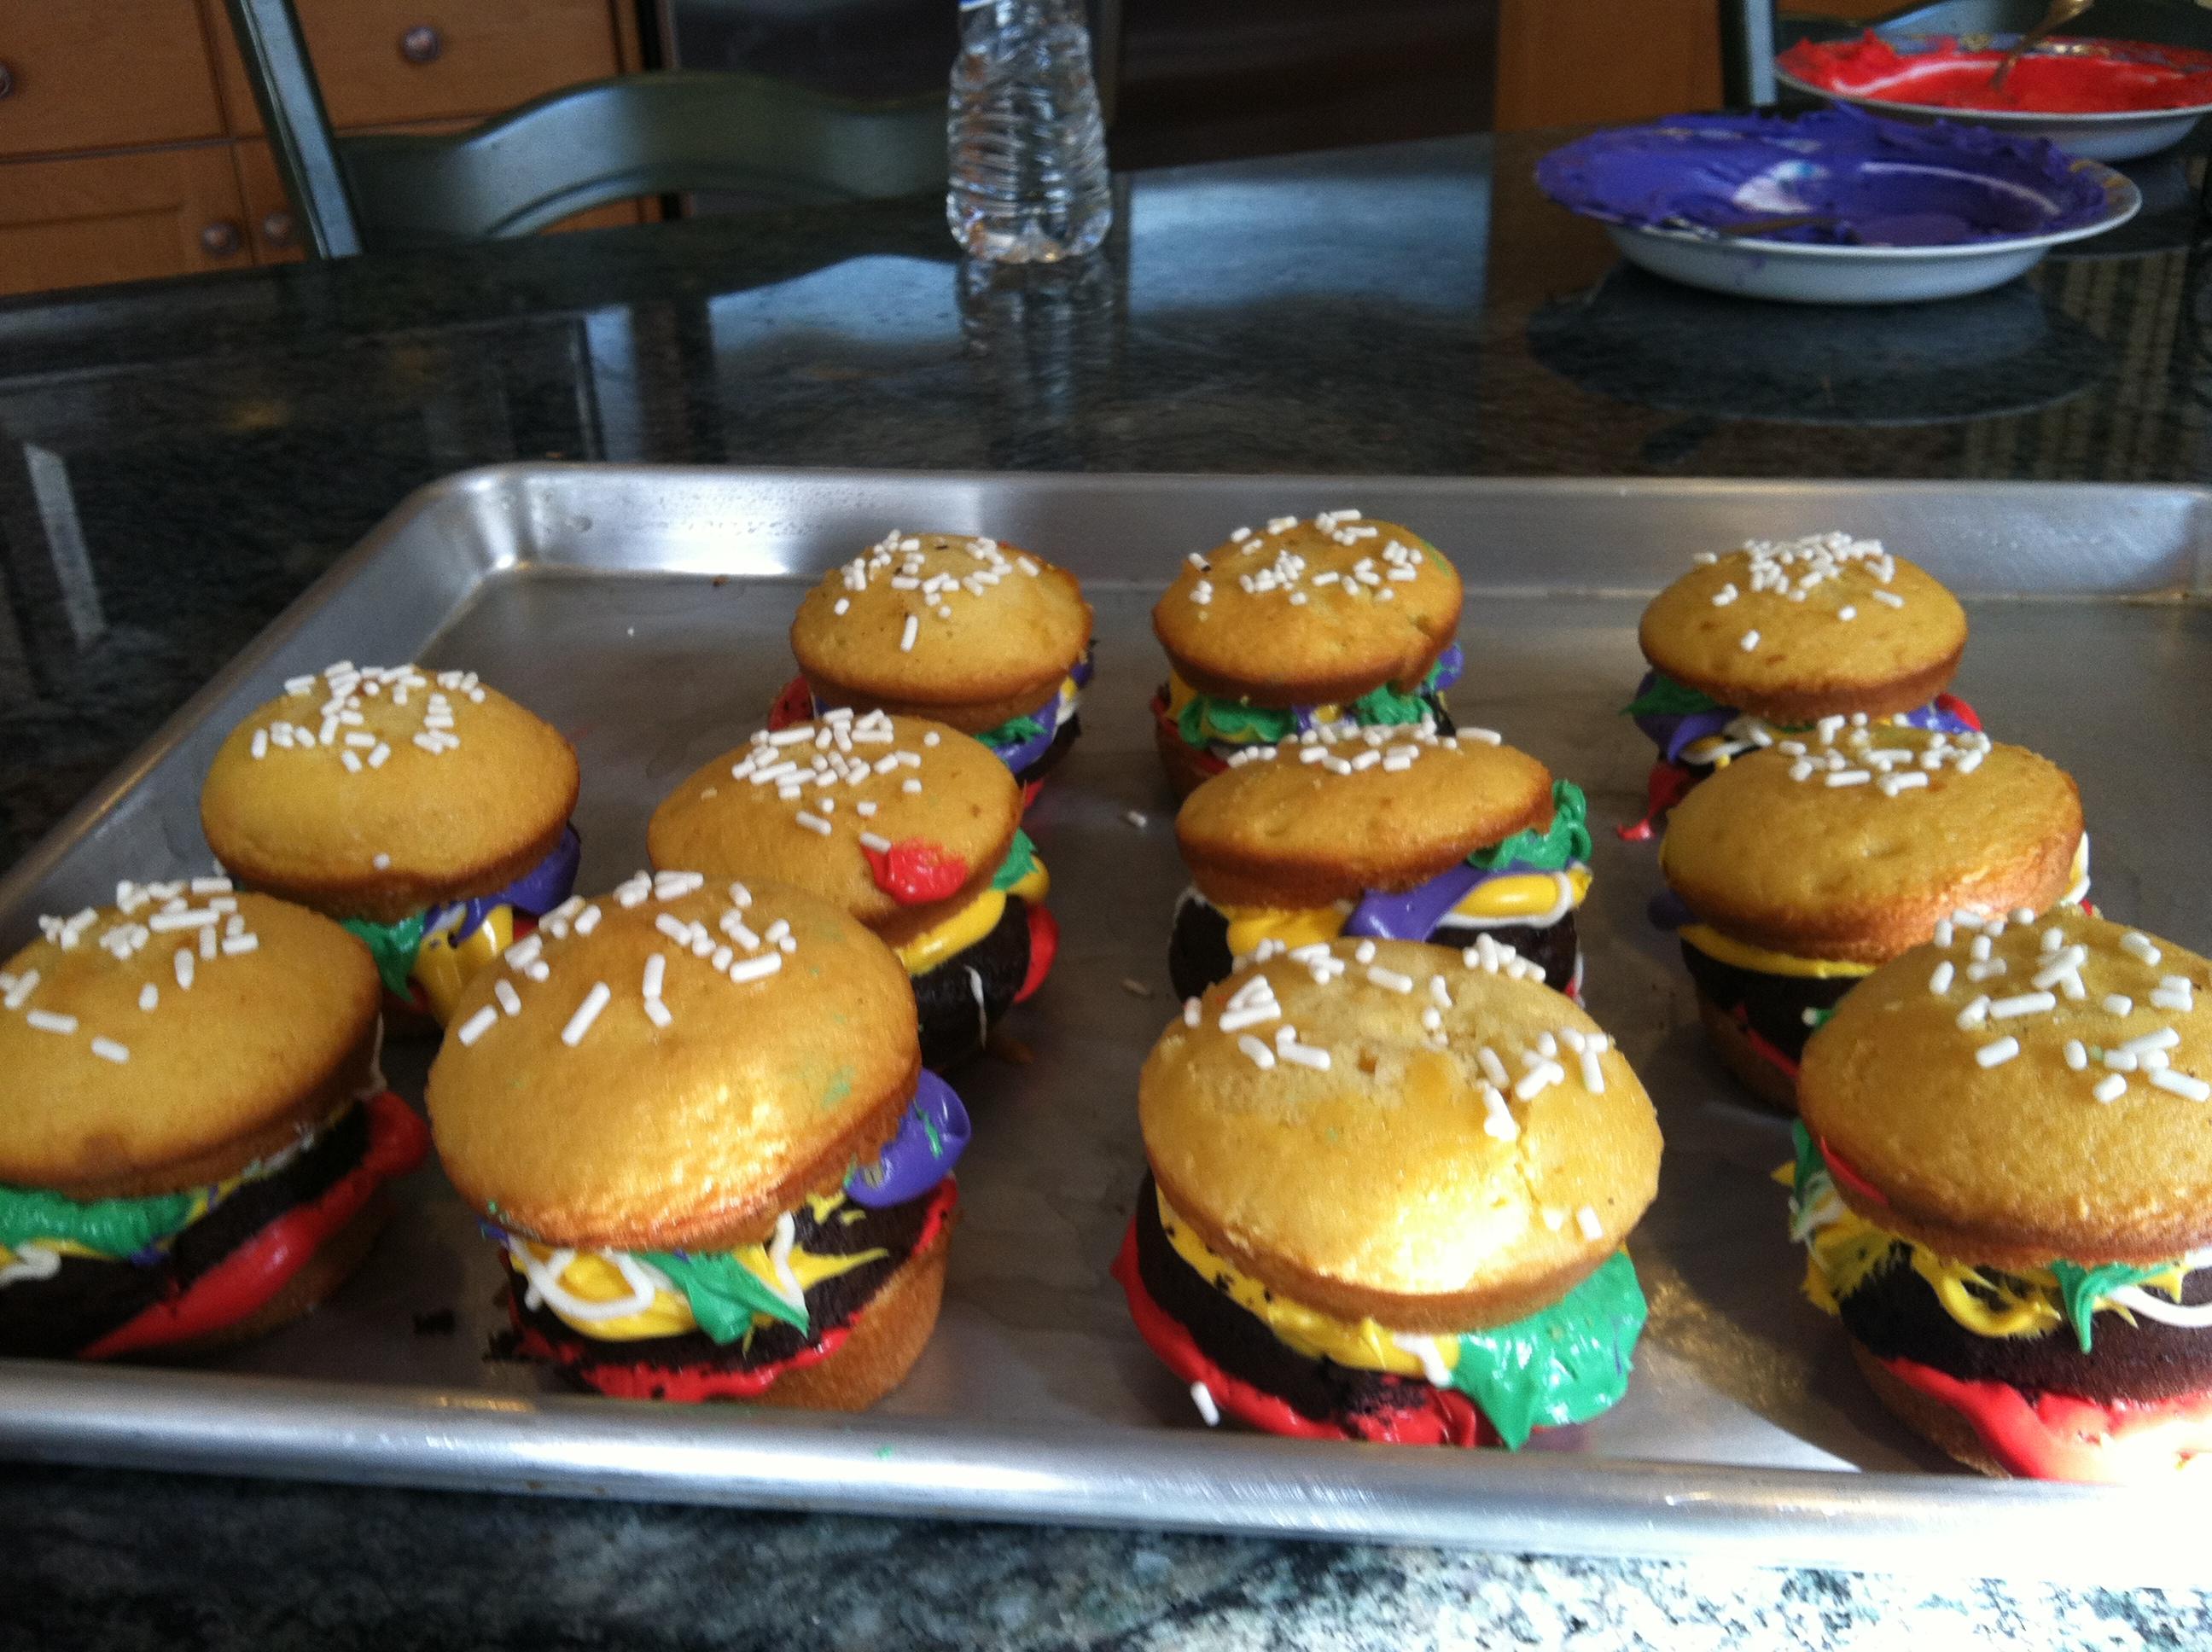 How To Make Krabby Patty Cupcakes Thatd Even SpongeBob SquarePants Jealous